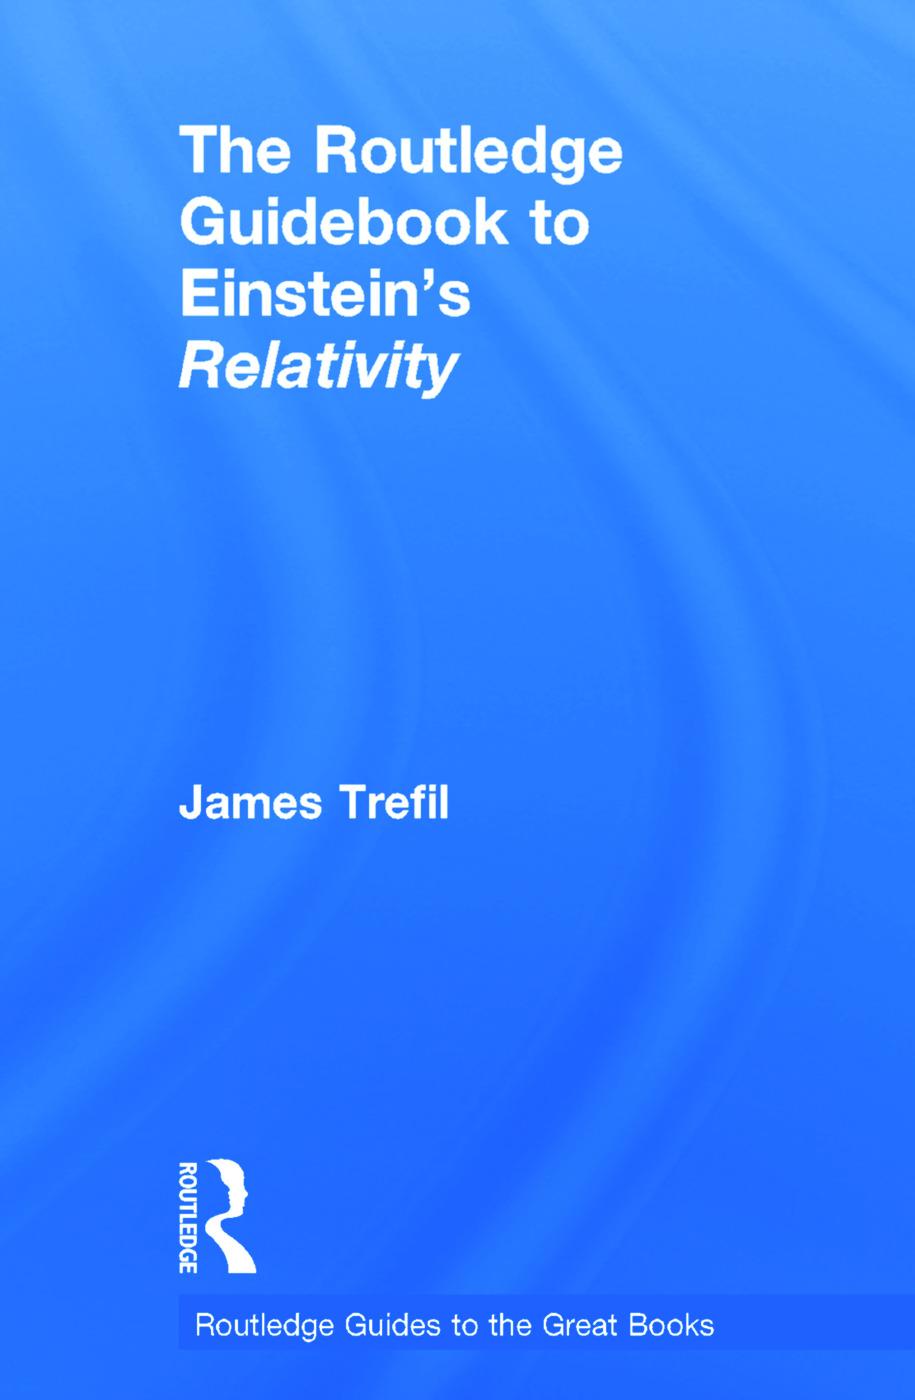 The future of relativity